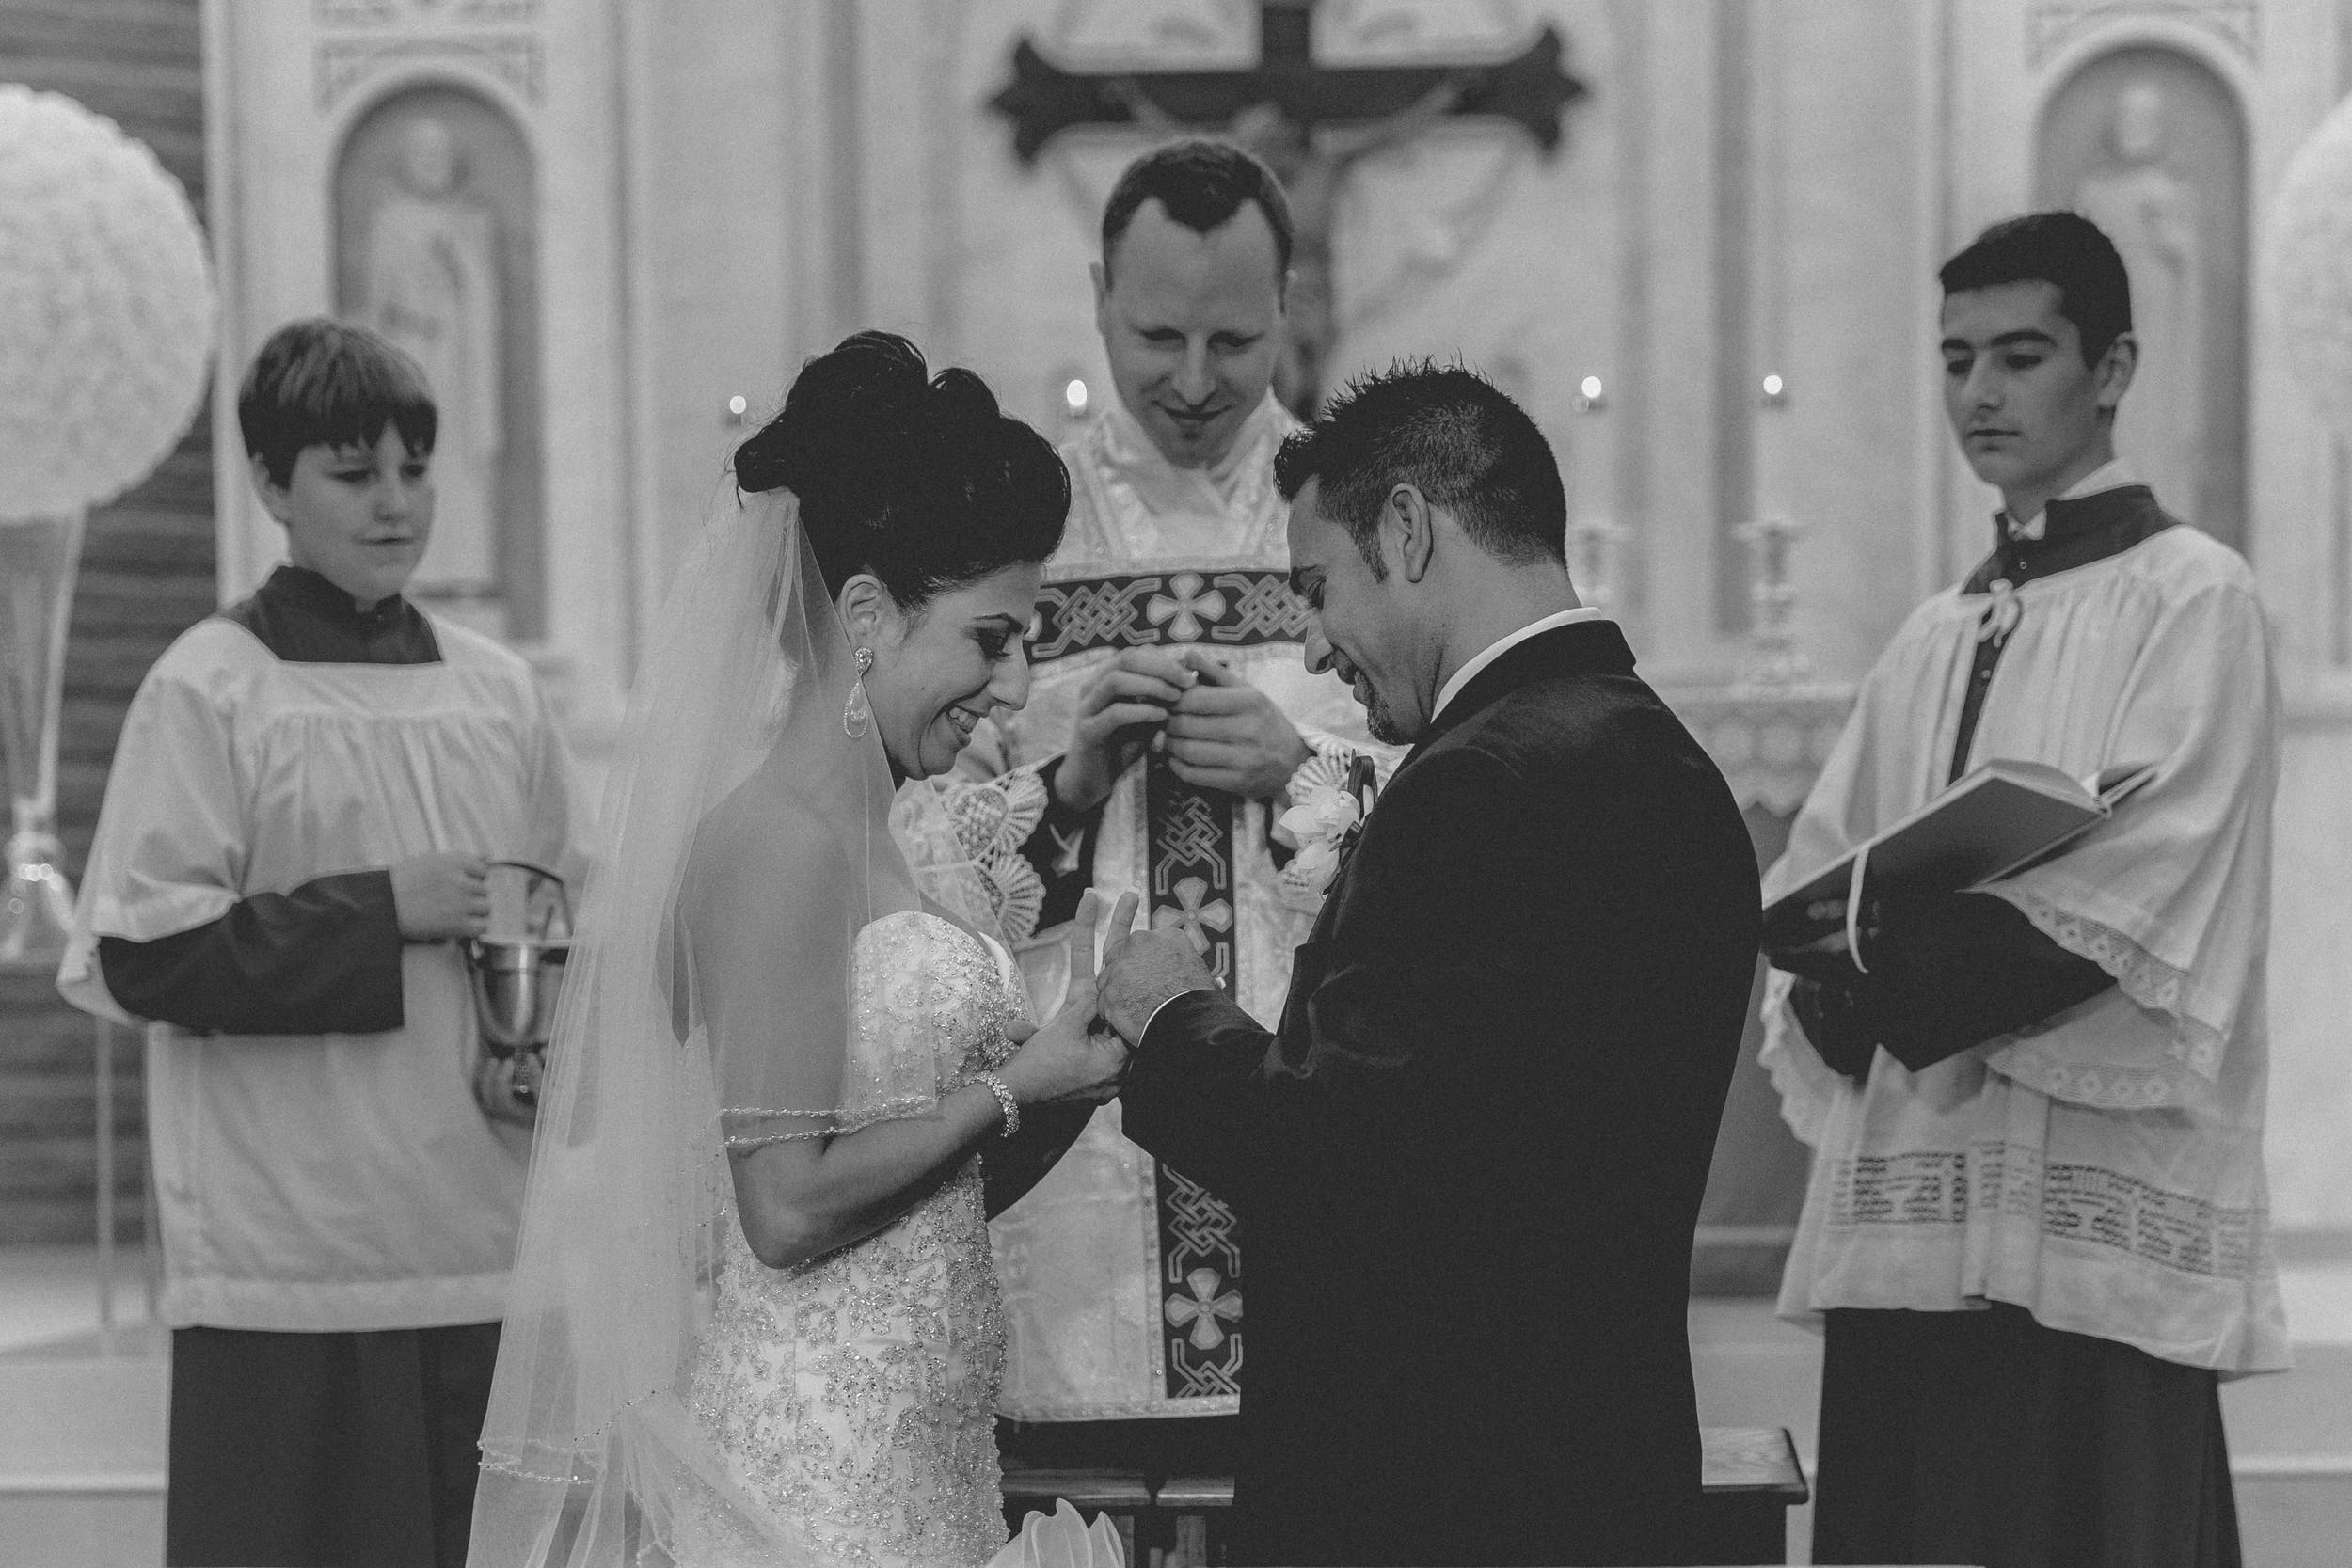 Toronto Wedding Photography | Caterina & Elvis, Pickering catholic wedding (35 of 39).jpg